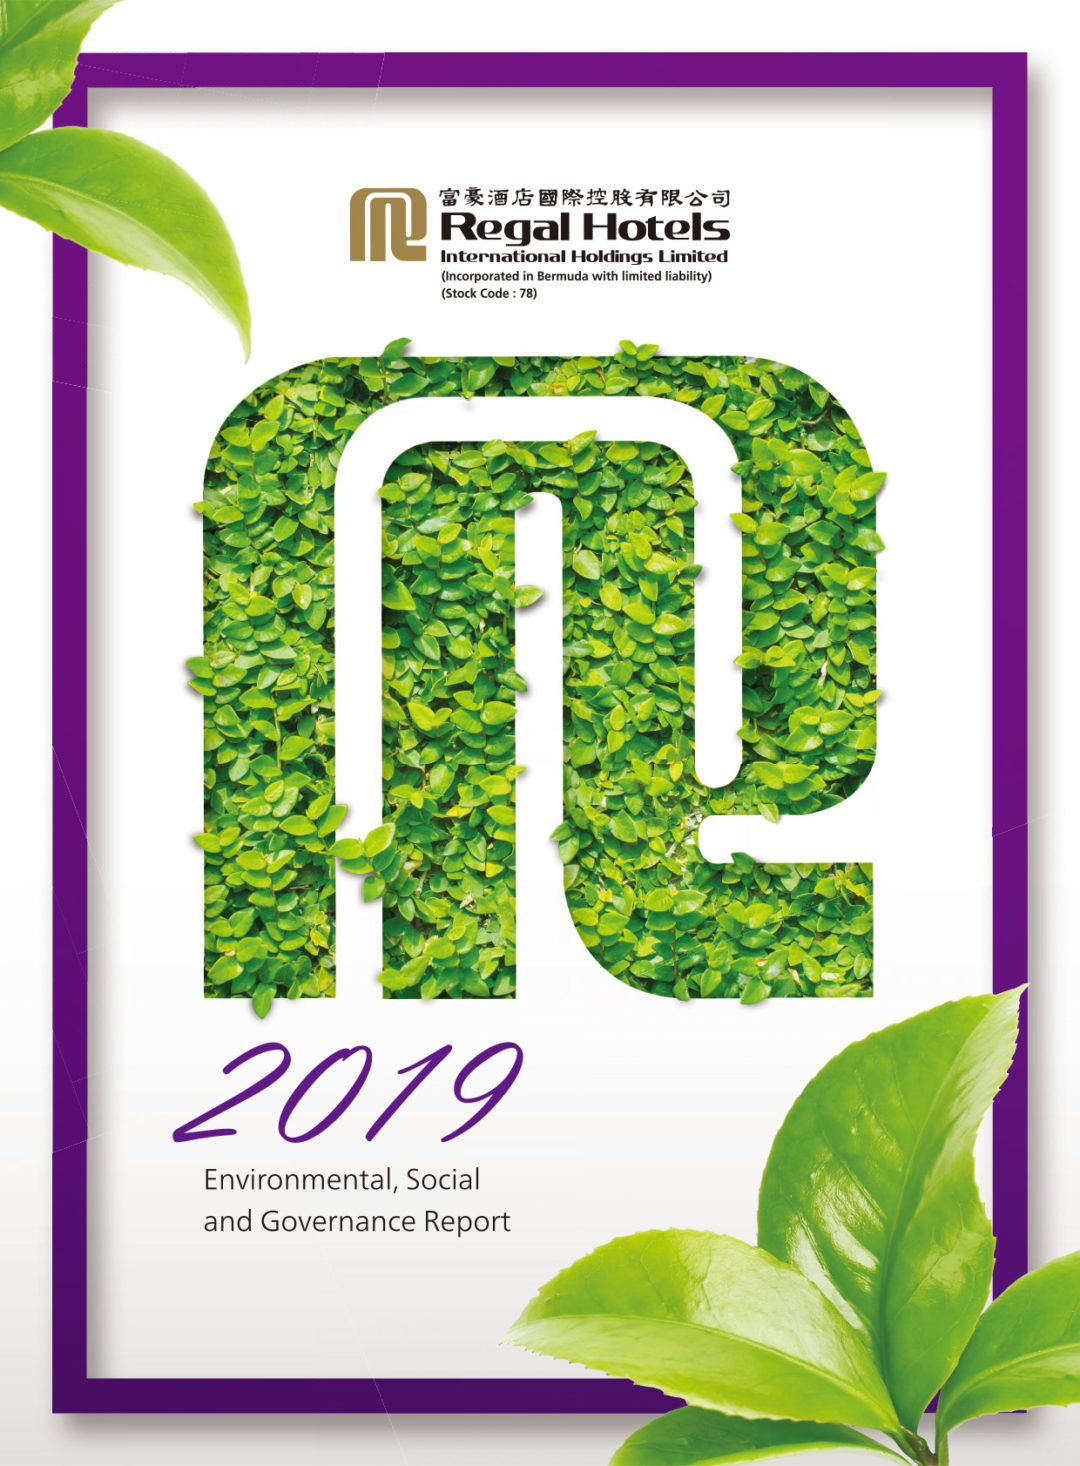 Regal Hotels International Holdings Limited ESG